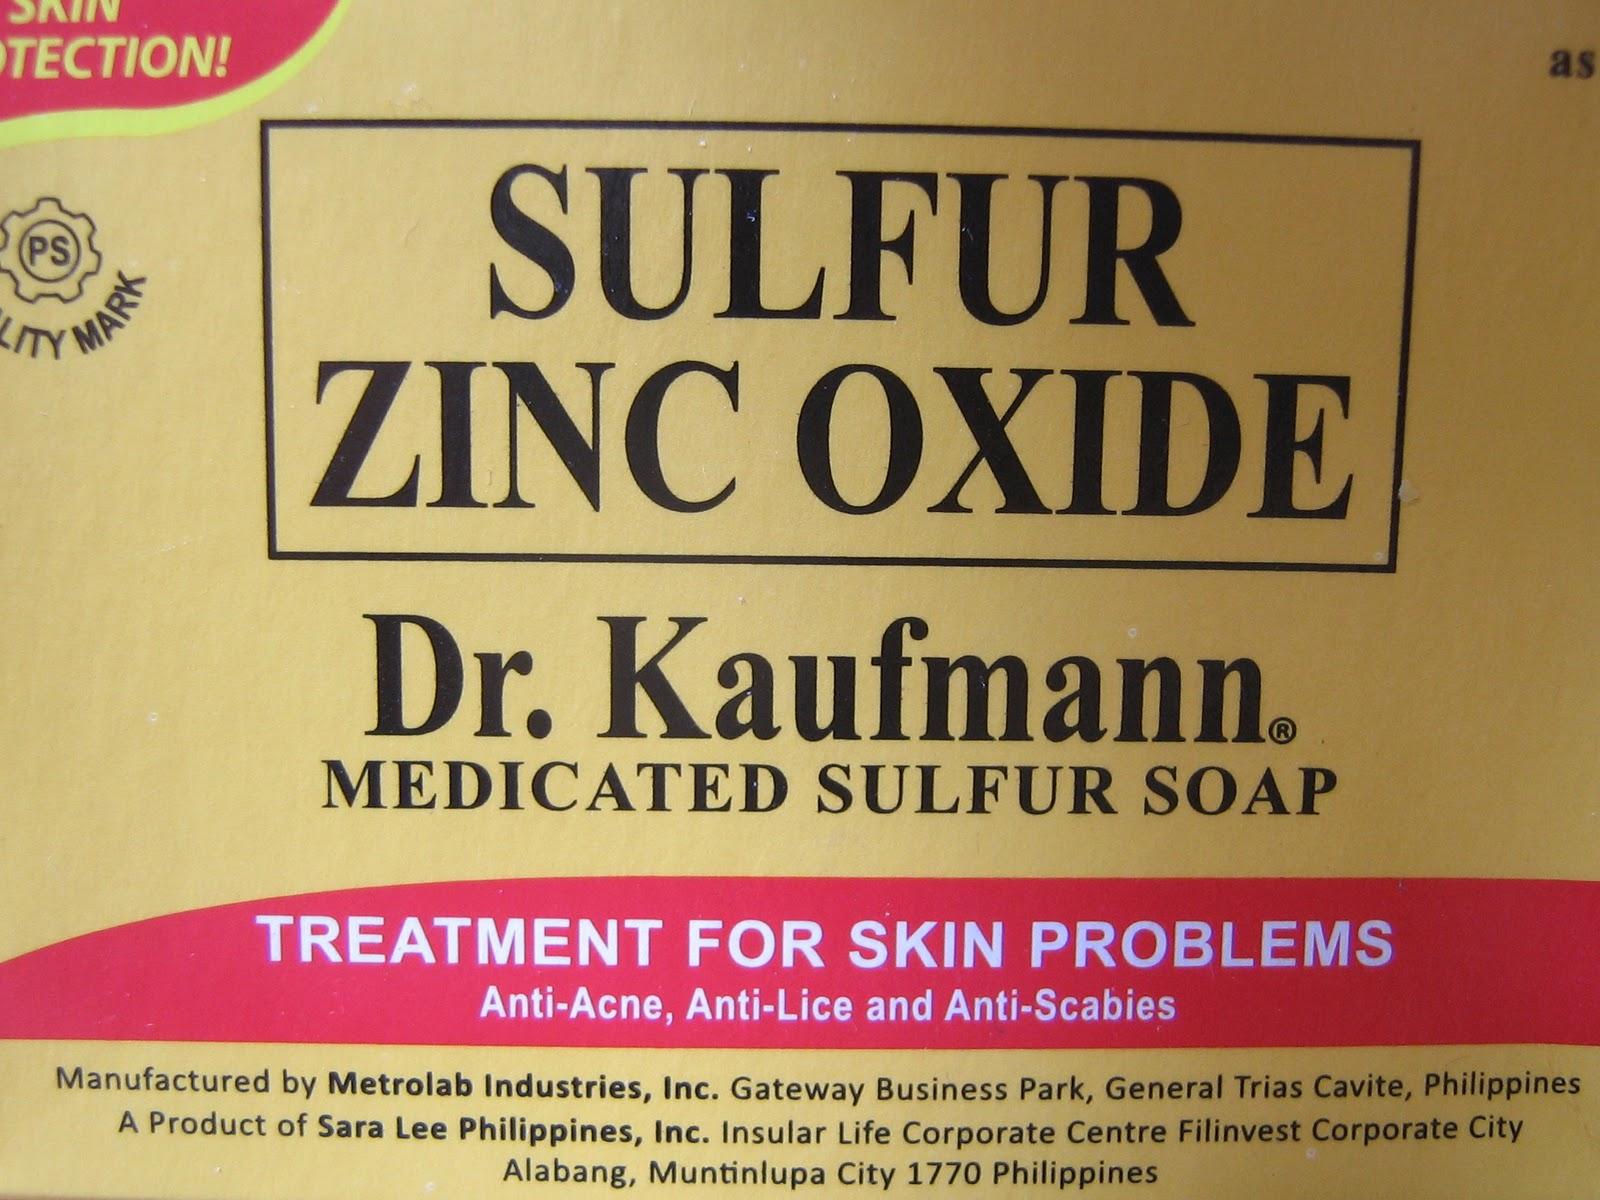 Dr  Kaufmann's Sulfur Soap   The Rich Street Deli     In Motion Again!